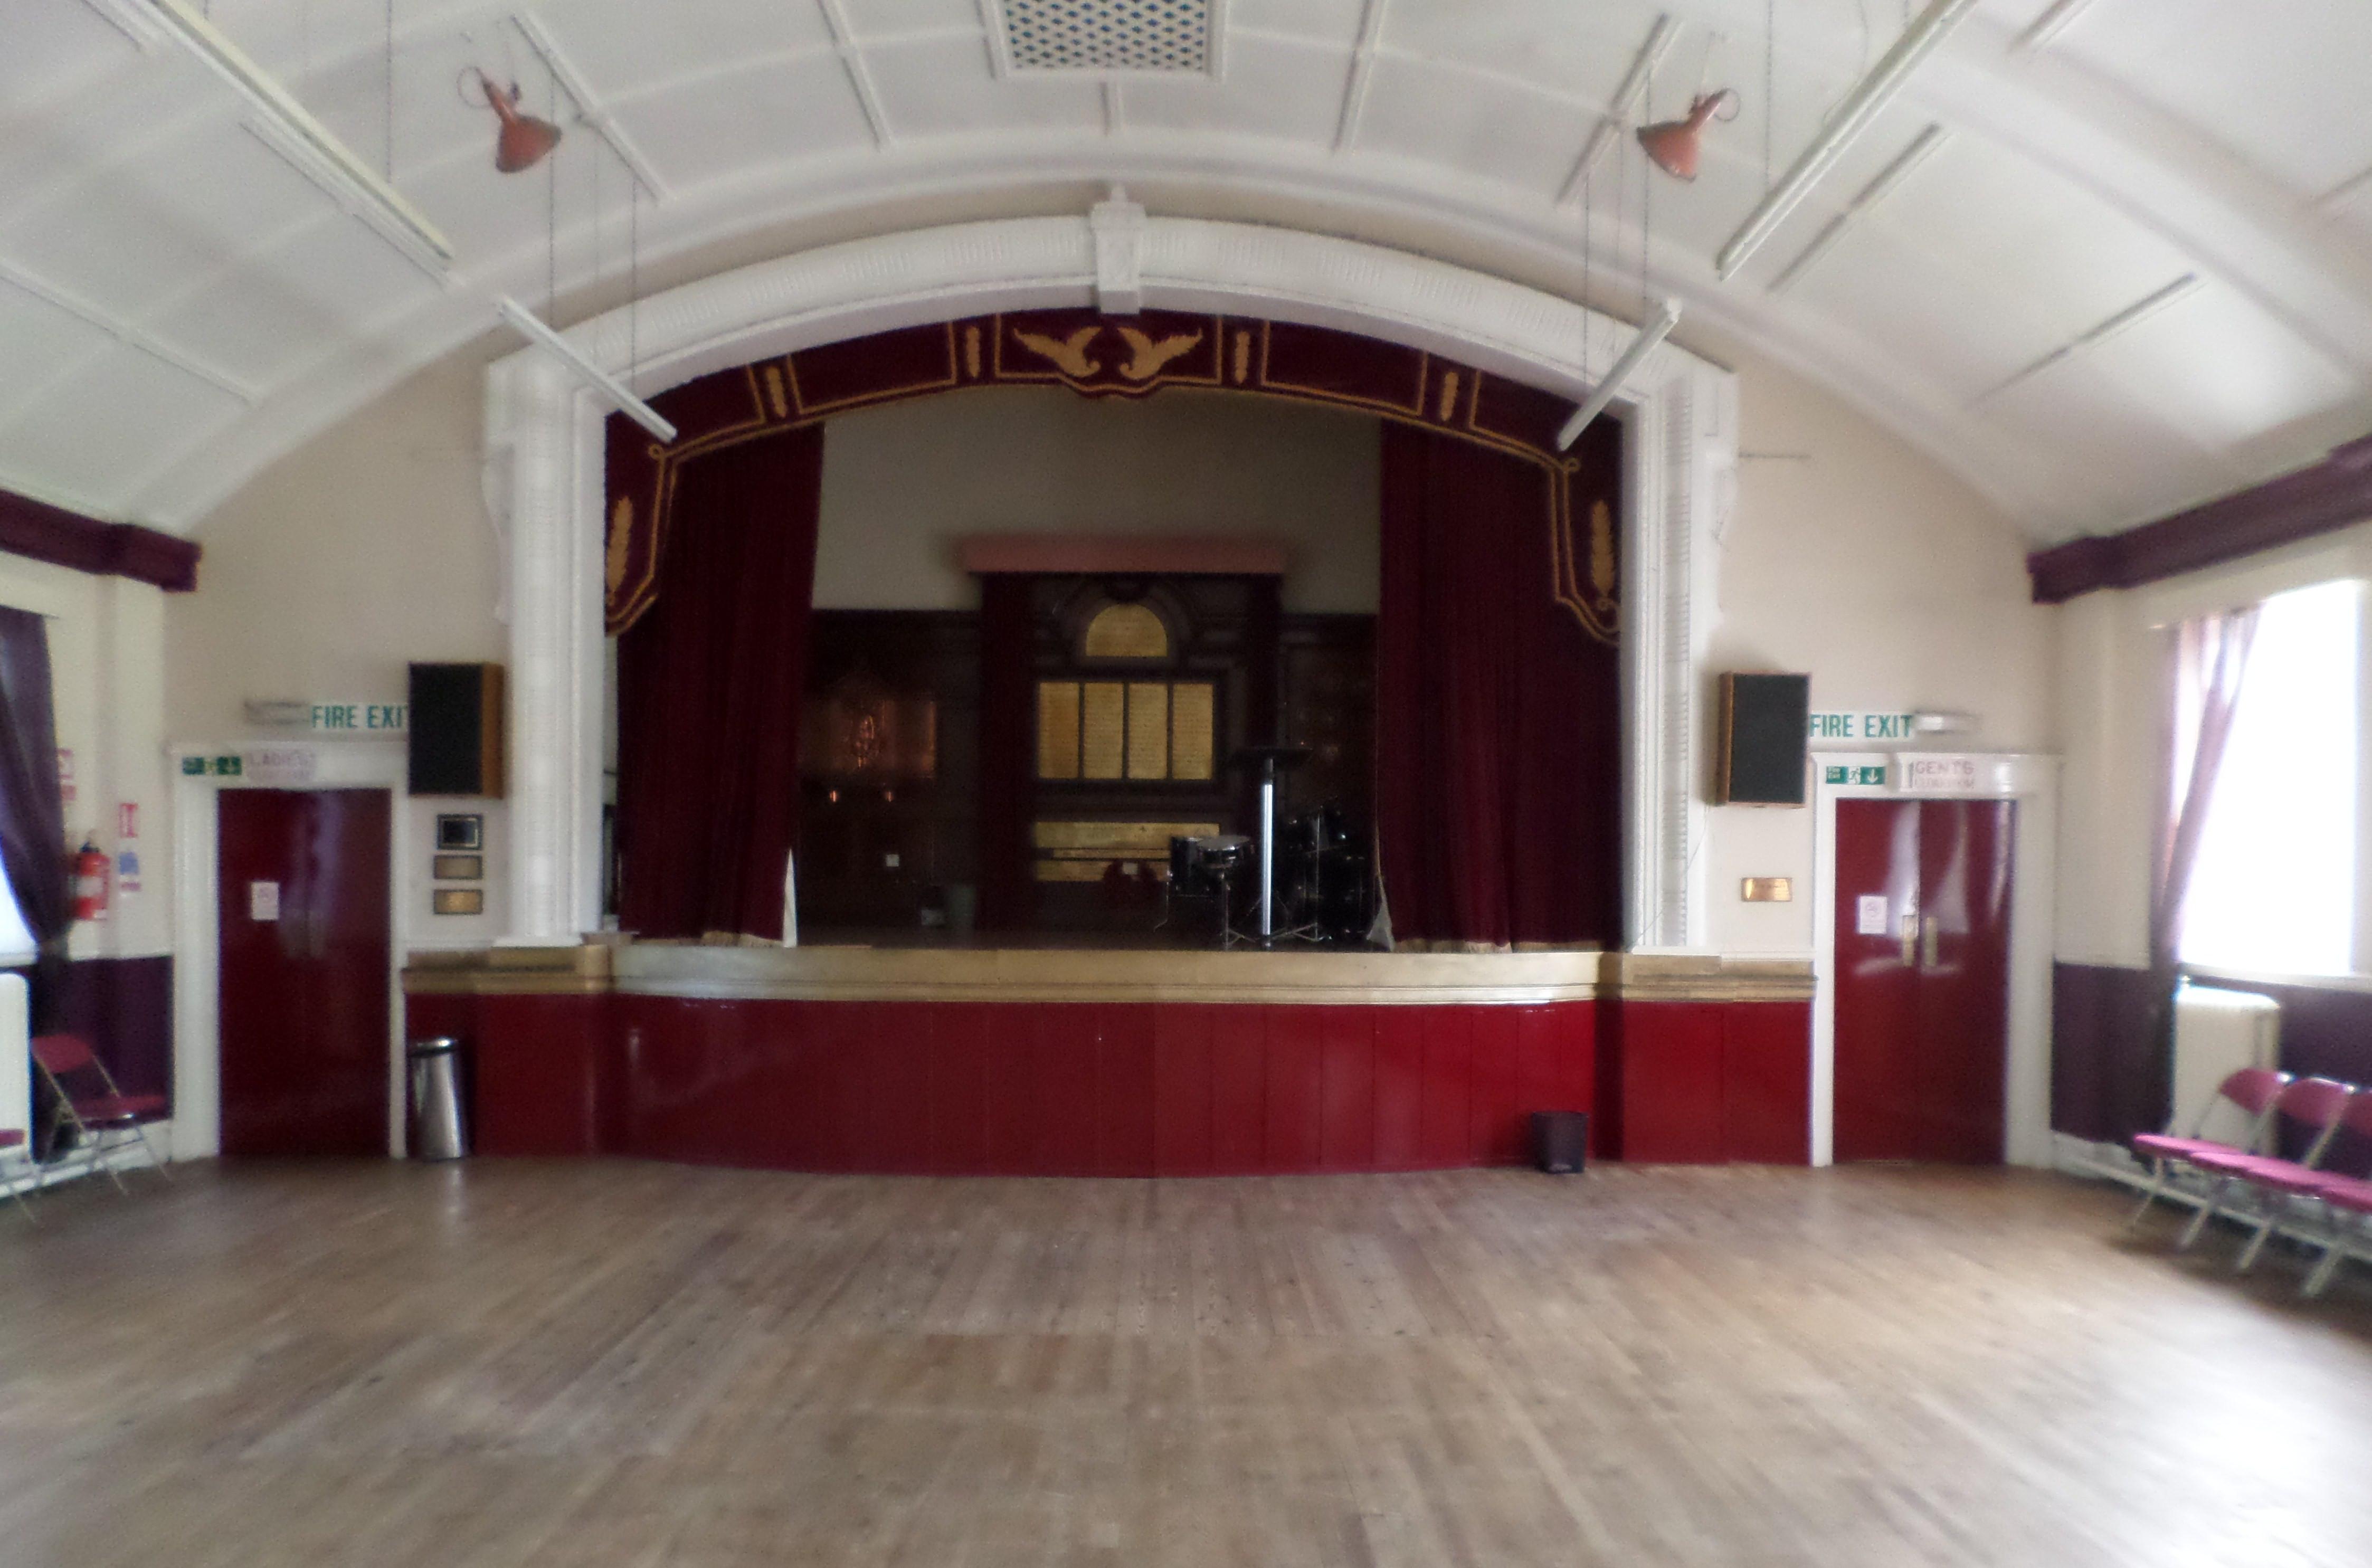 Main Hall - 1 Hour